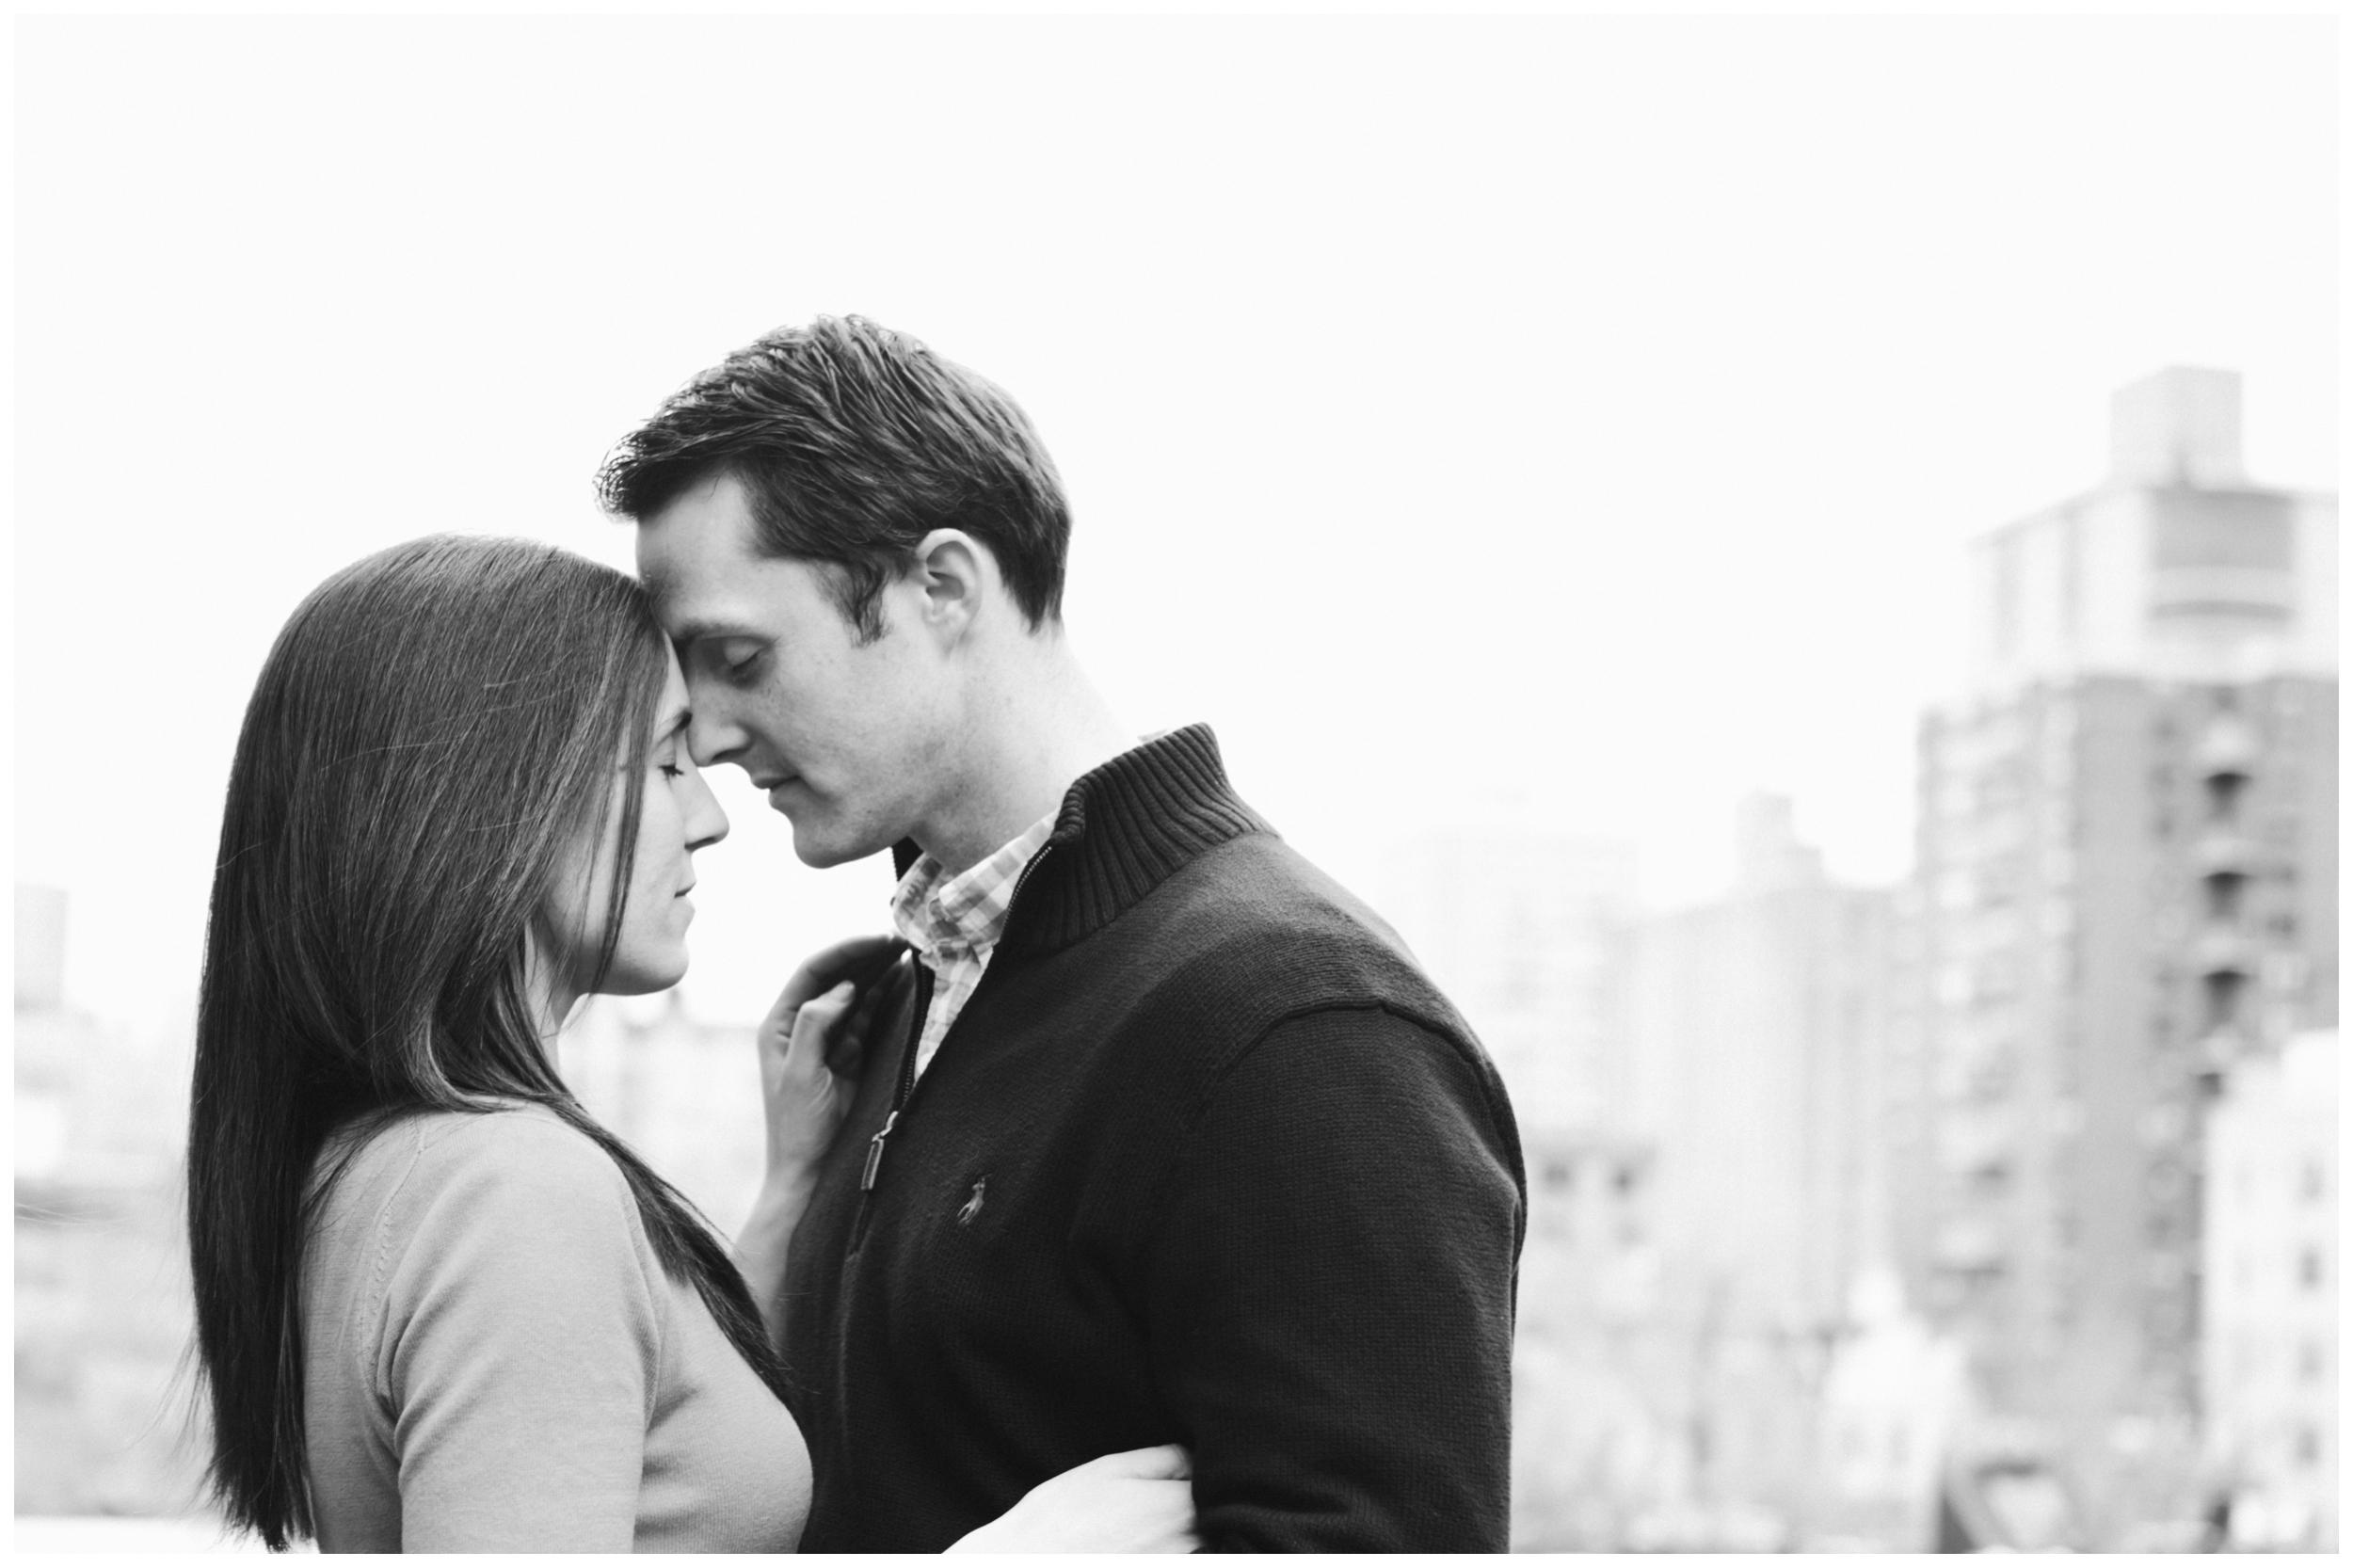 14-NYC-Rooftop-Engagement-Session-Allison-Sullivan.jpg